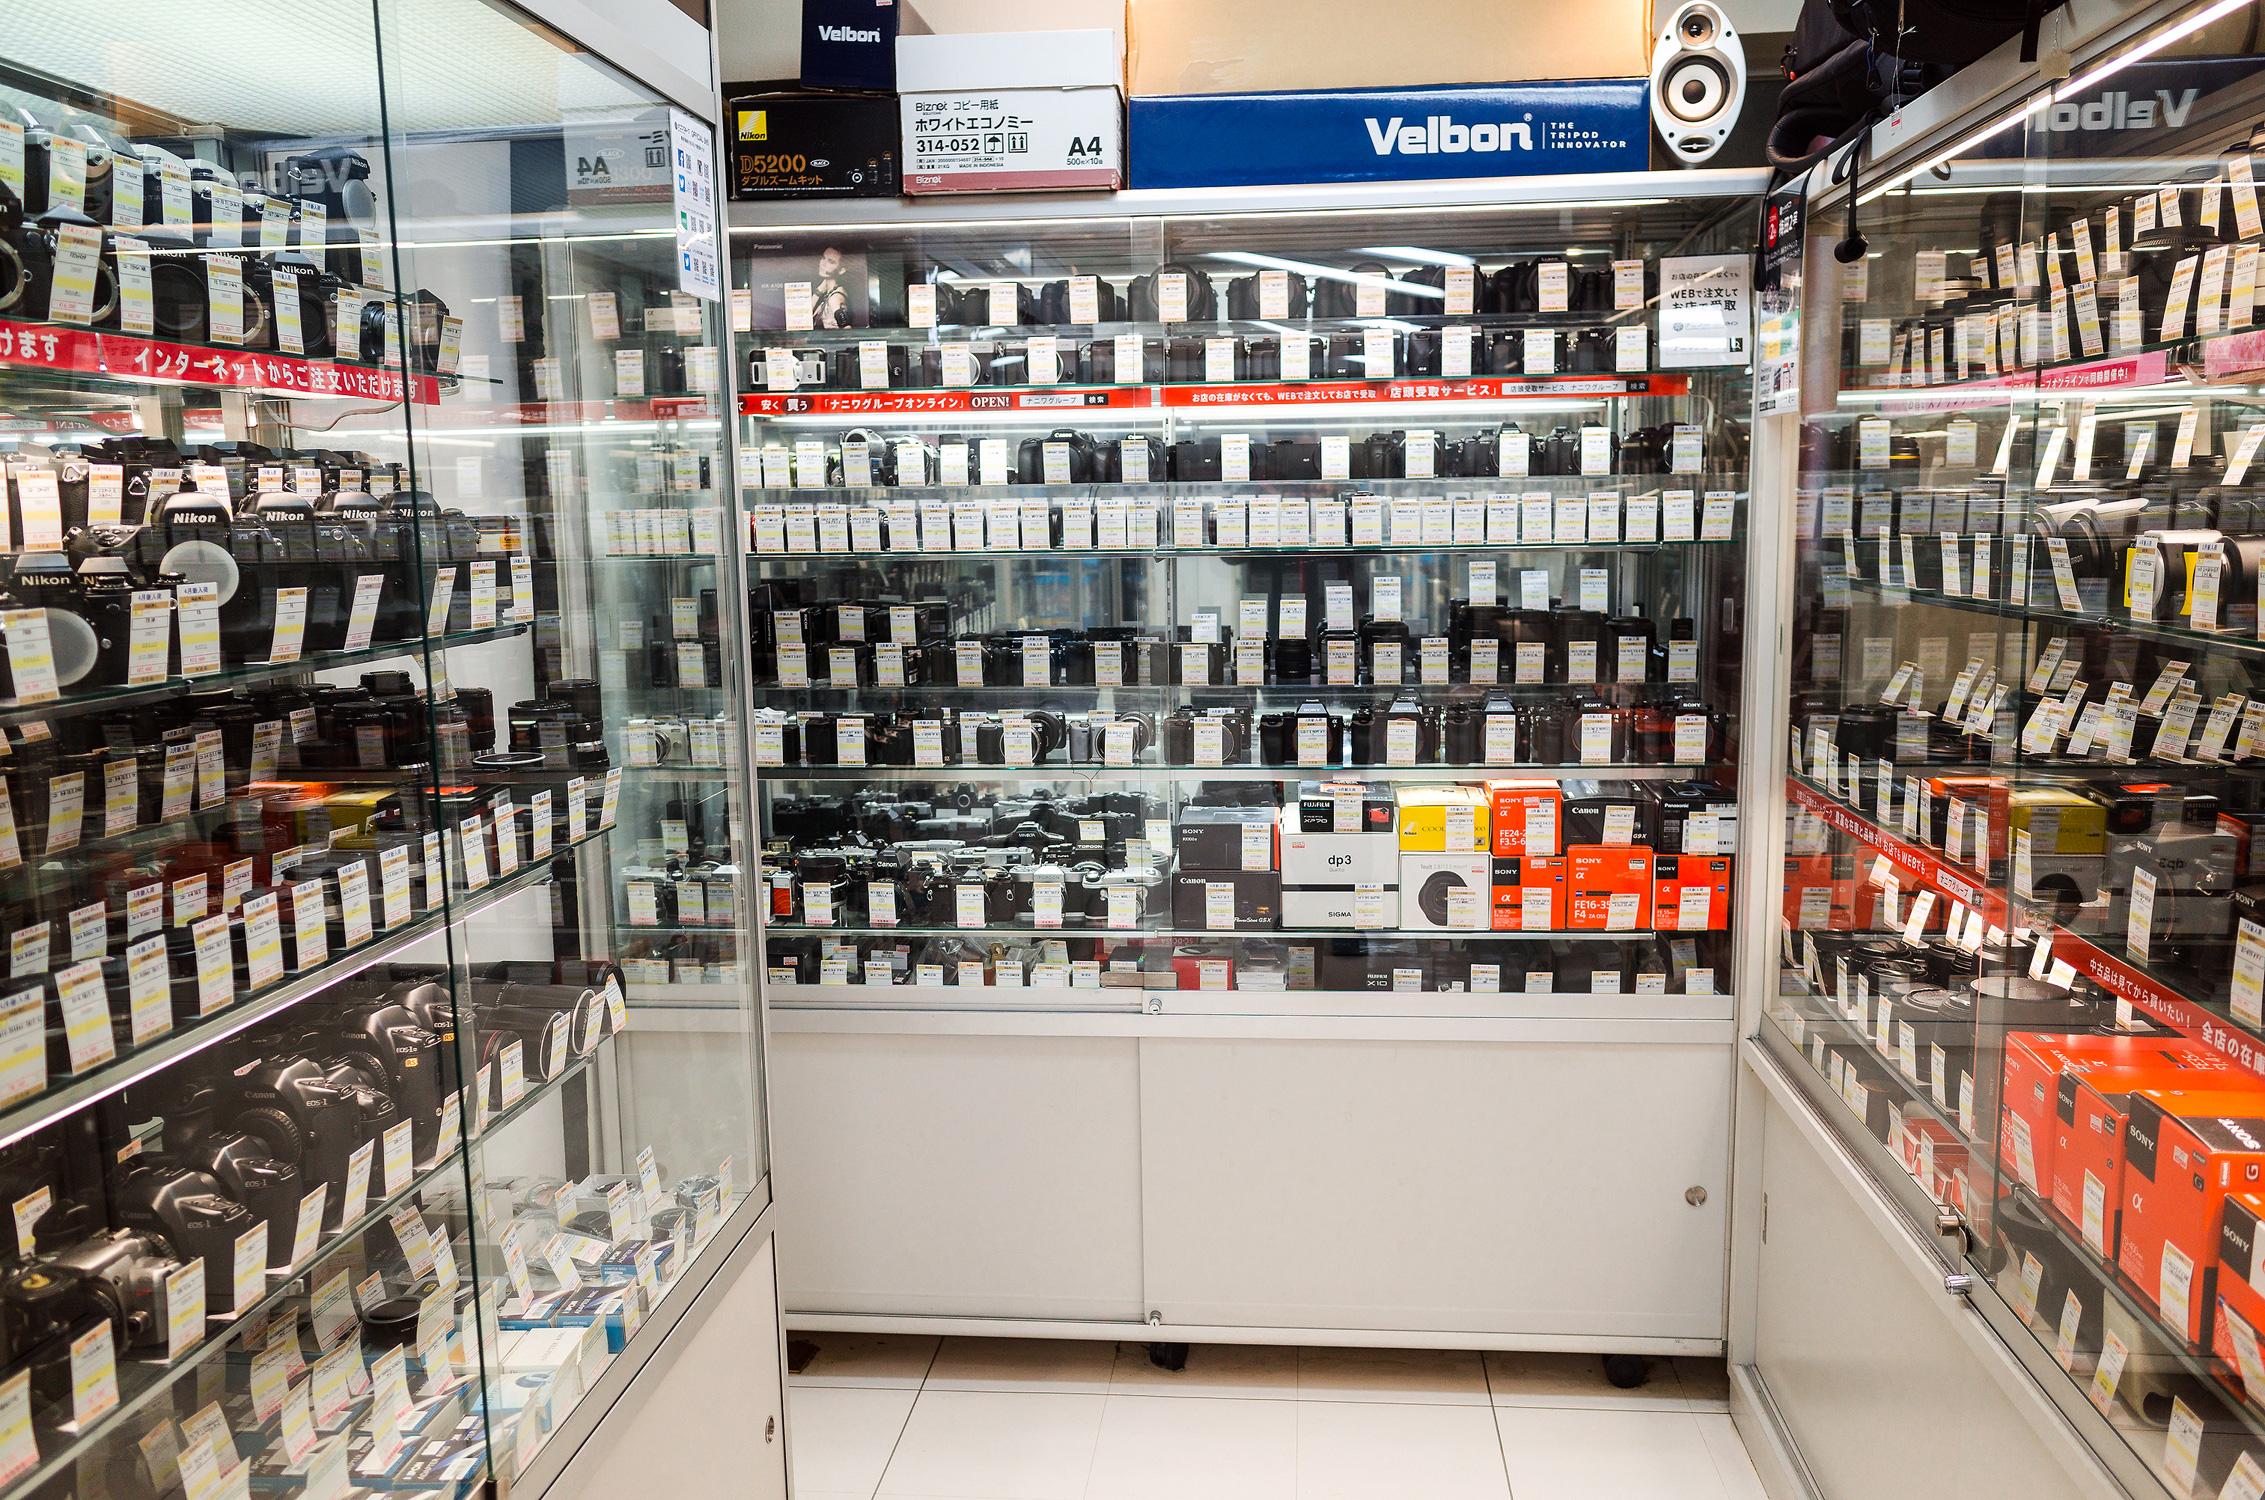 Used camera store in Osaka Umeda